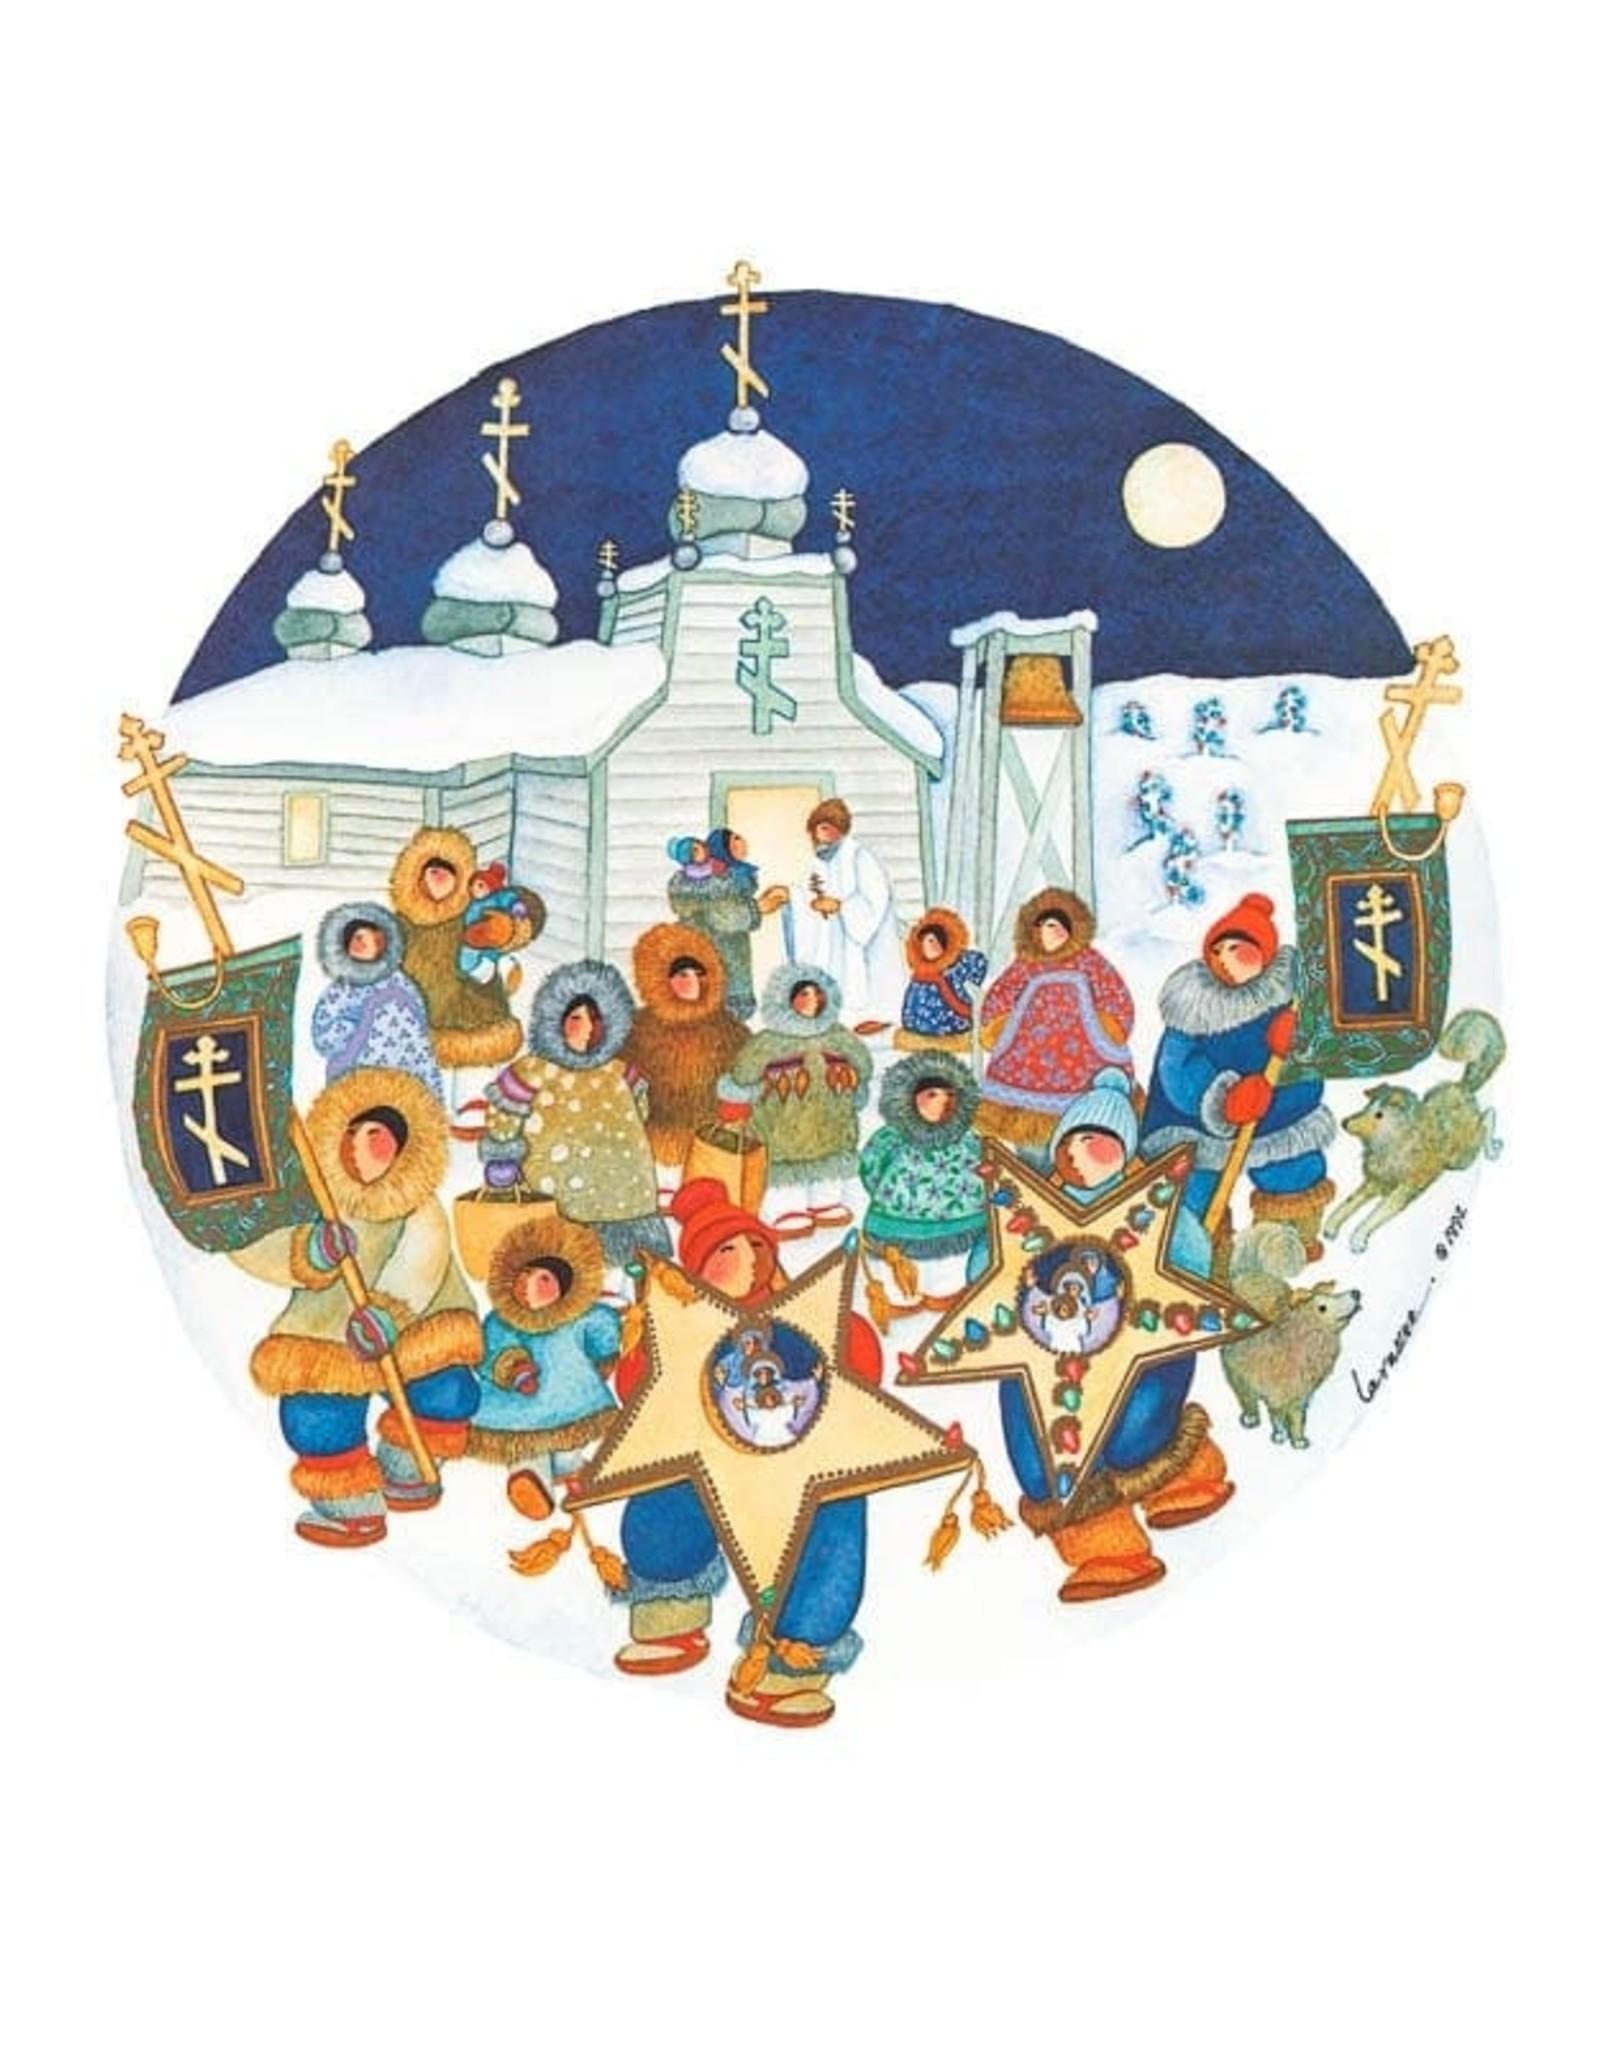 Barbara Lavallee Village Traditions (art card) | Barbara Lavallee